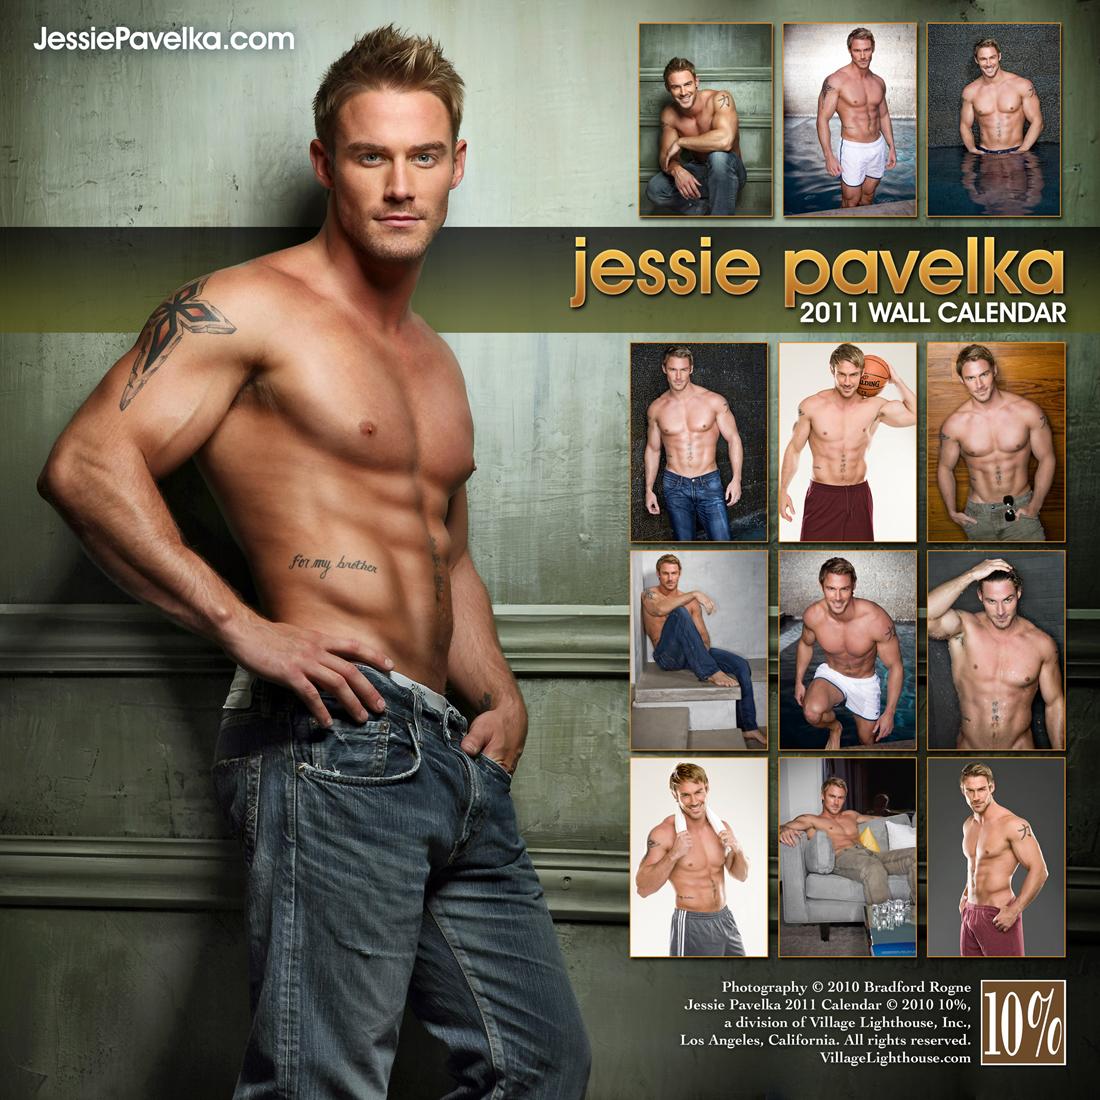 Jessie Pavelka Photographed by Bradford Rogne